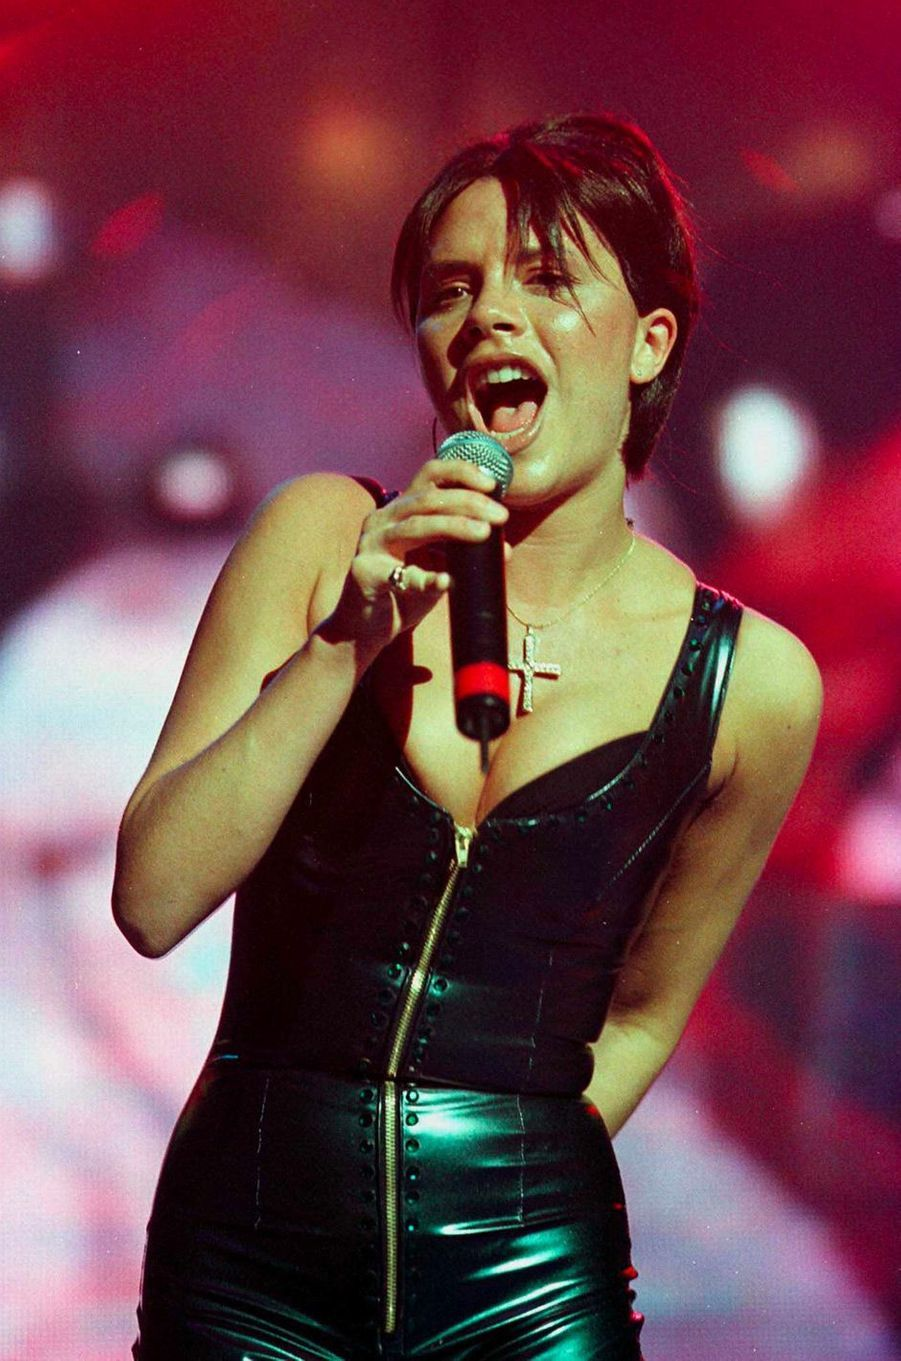 Victoria Beckham, aka Posh Spice, le 15 juin 1998